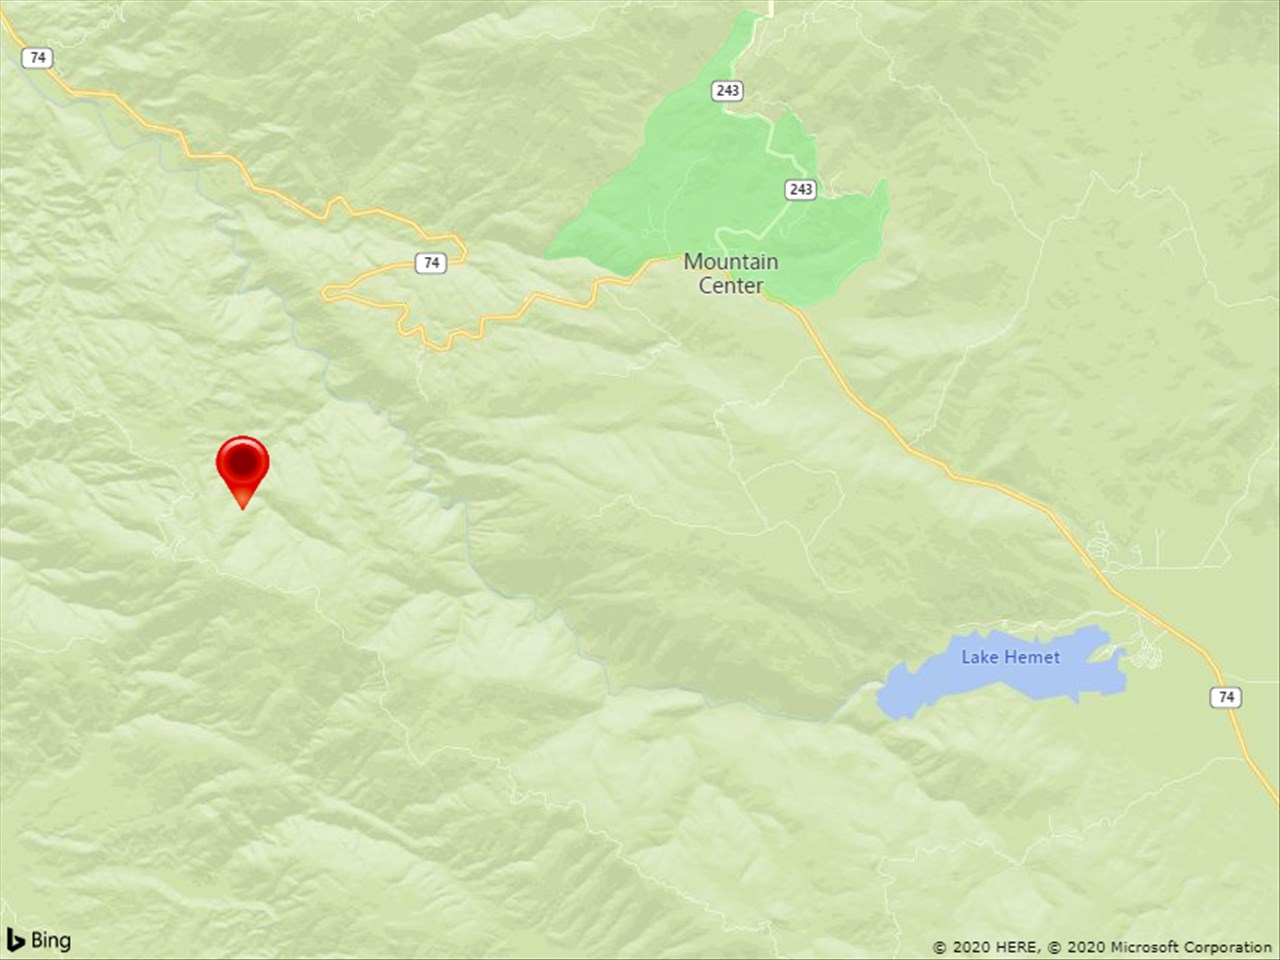 Twin-Engine Plane Crashes Near Mountain Center